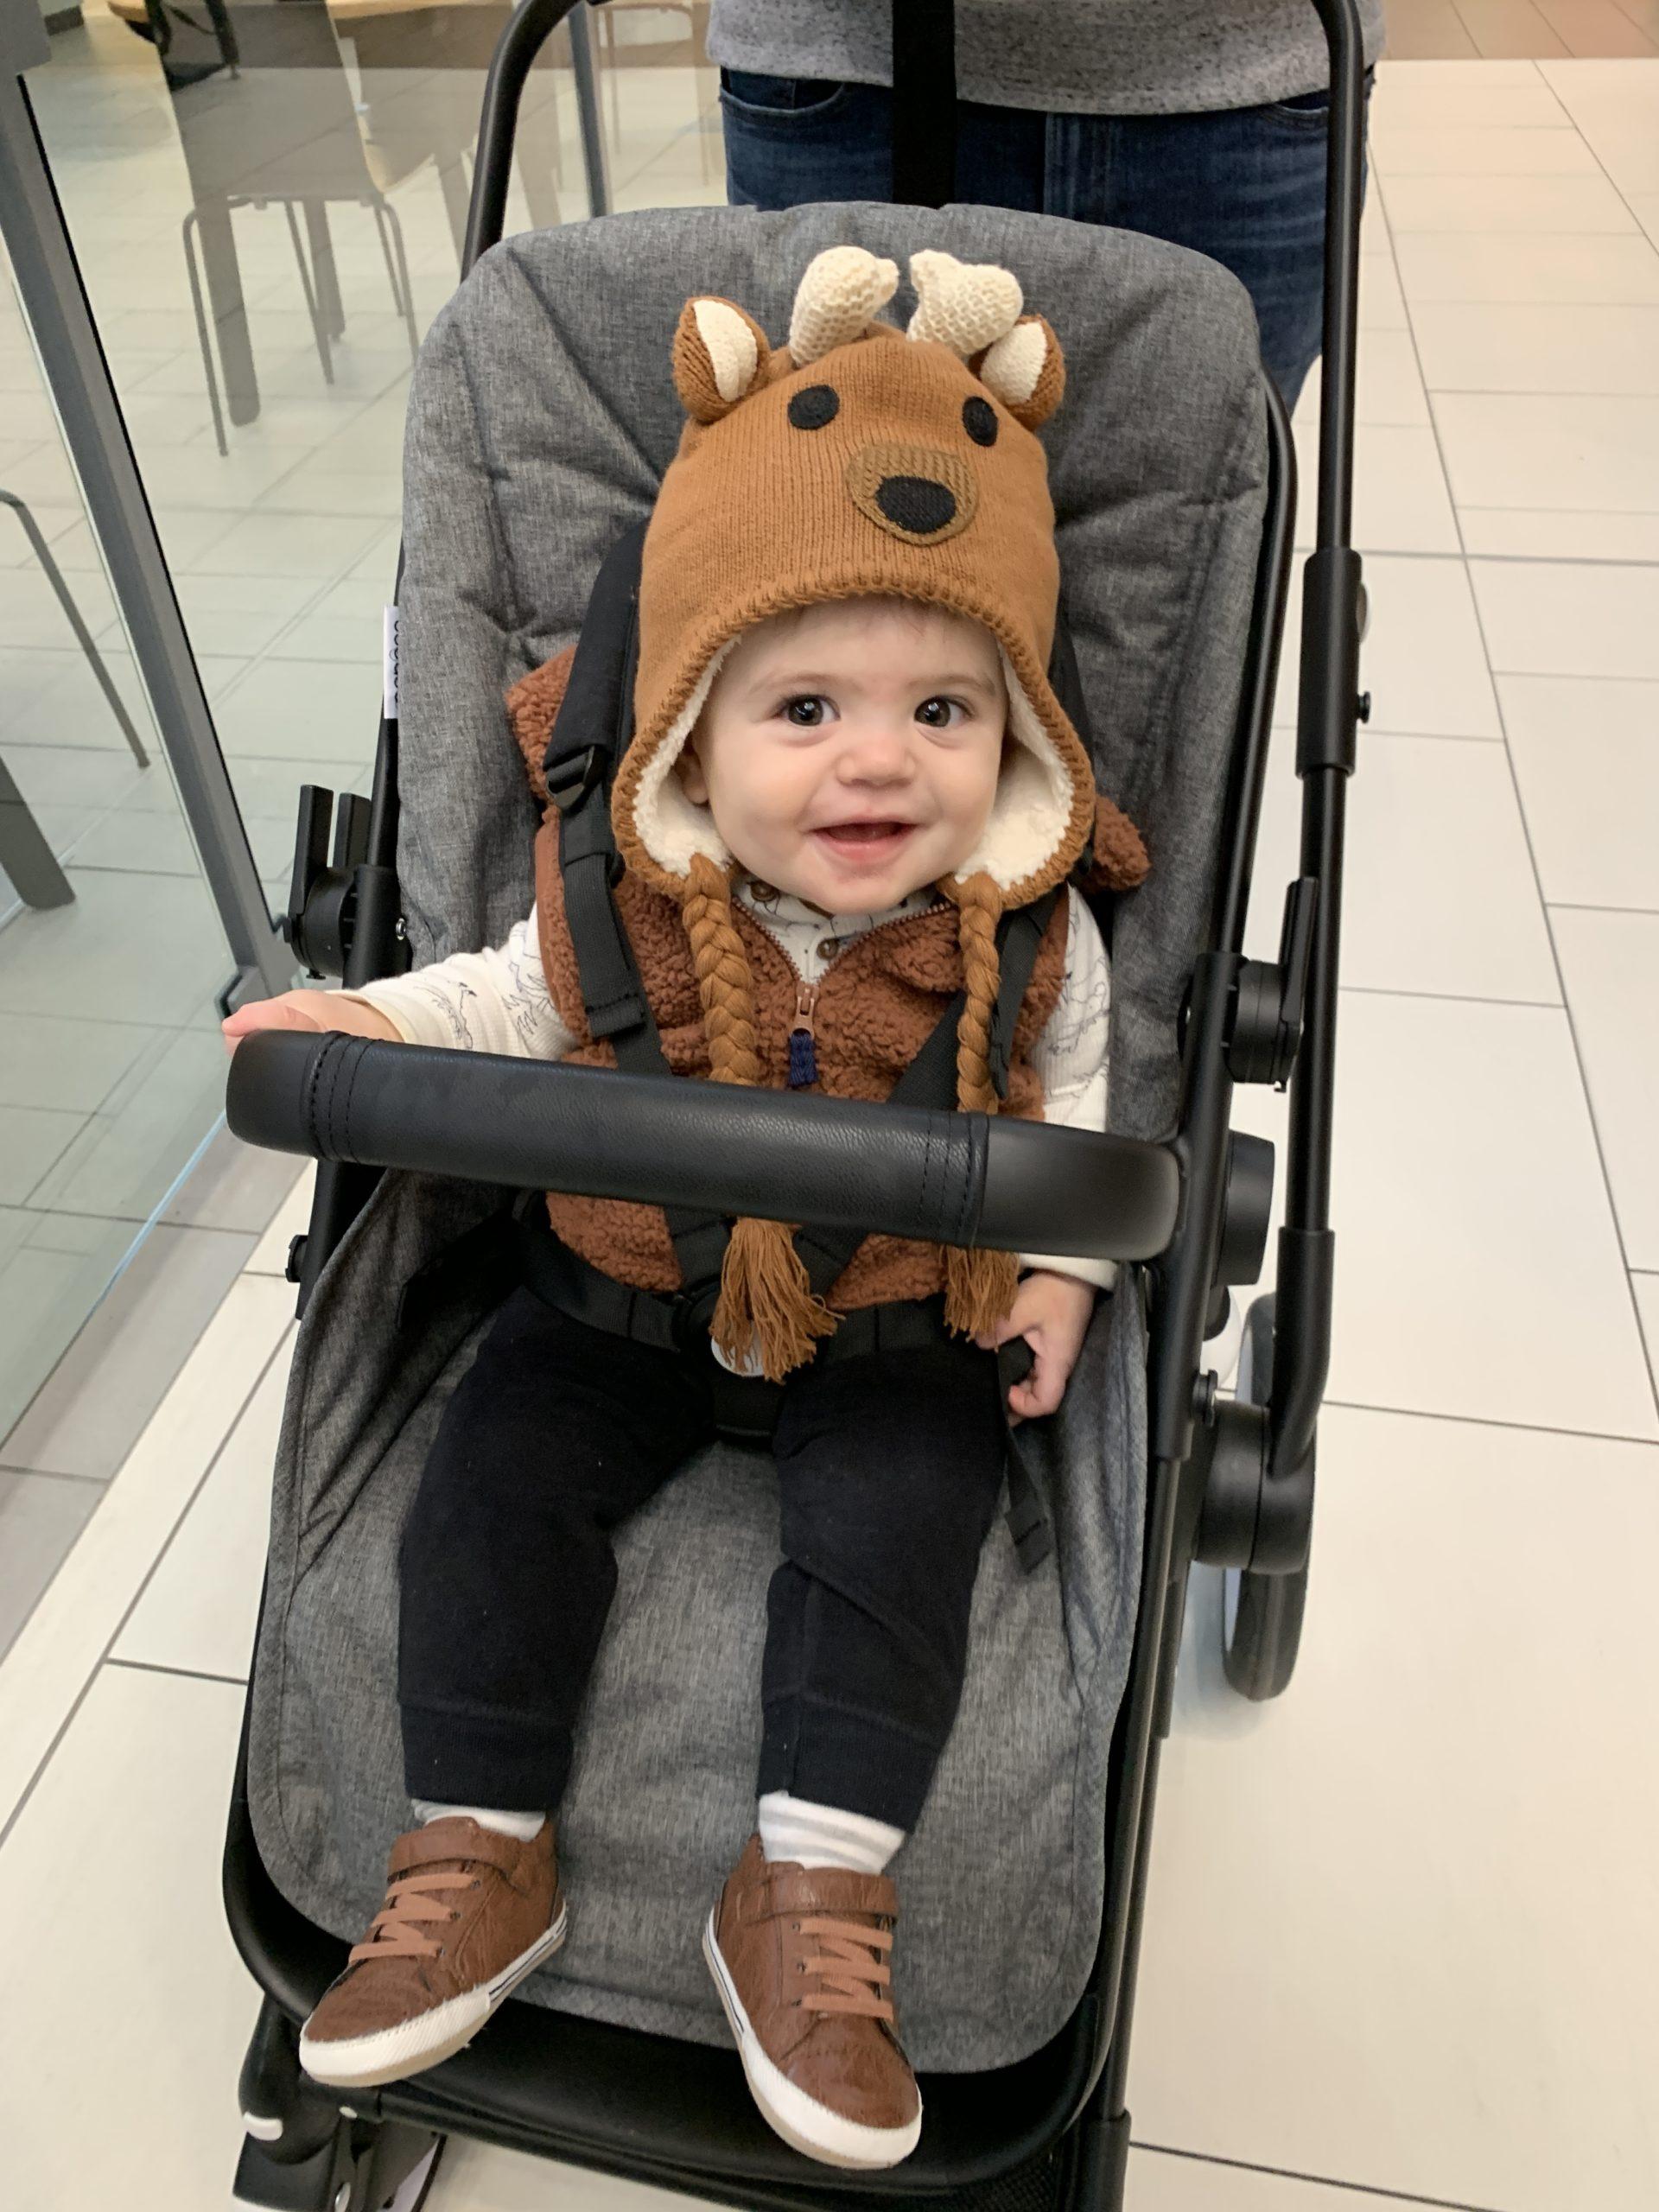 Keldon 10 month update, baby milestones 10 months